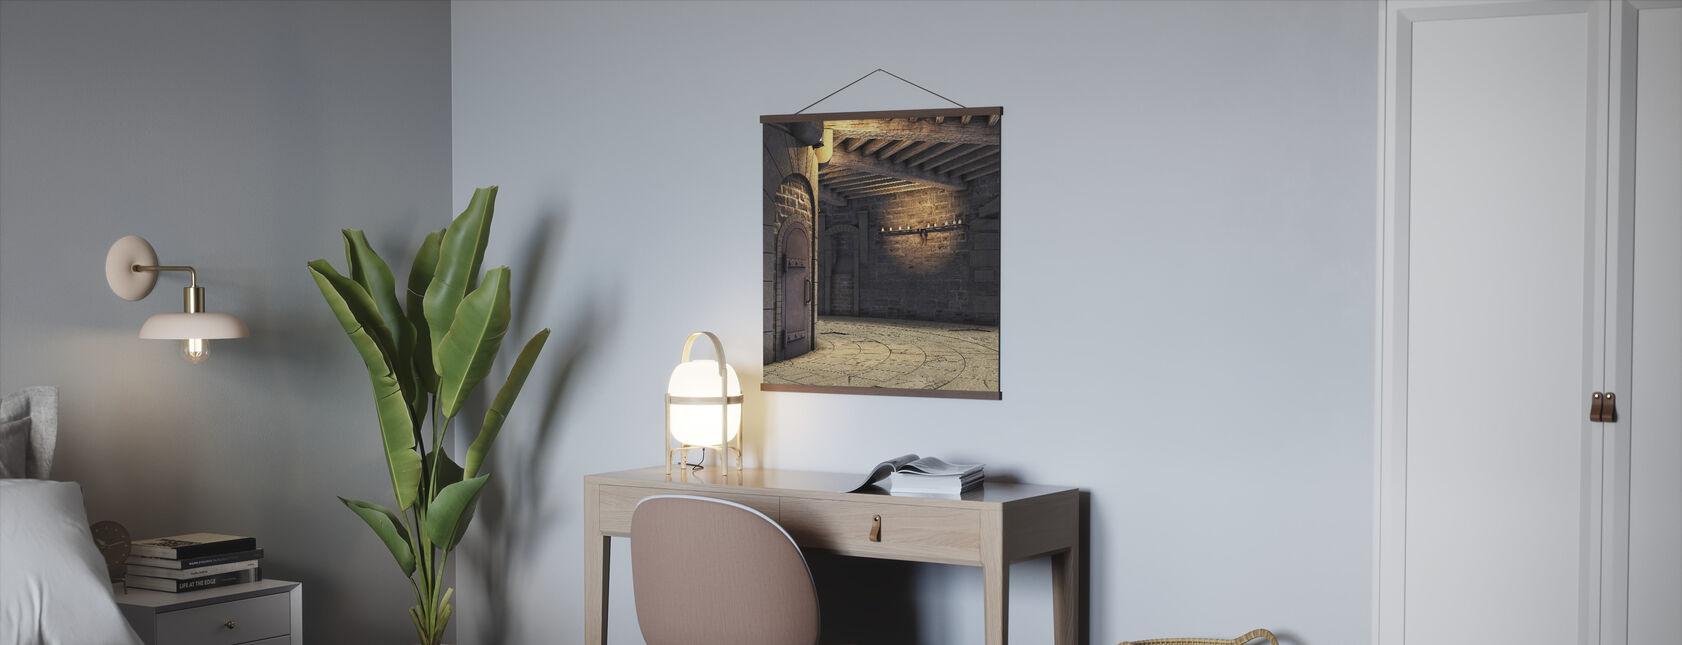 Toren Rotunda - Poster - Kantoor